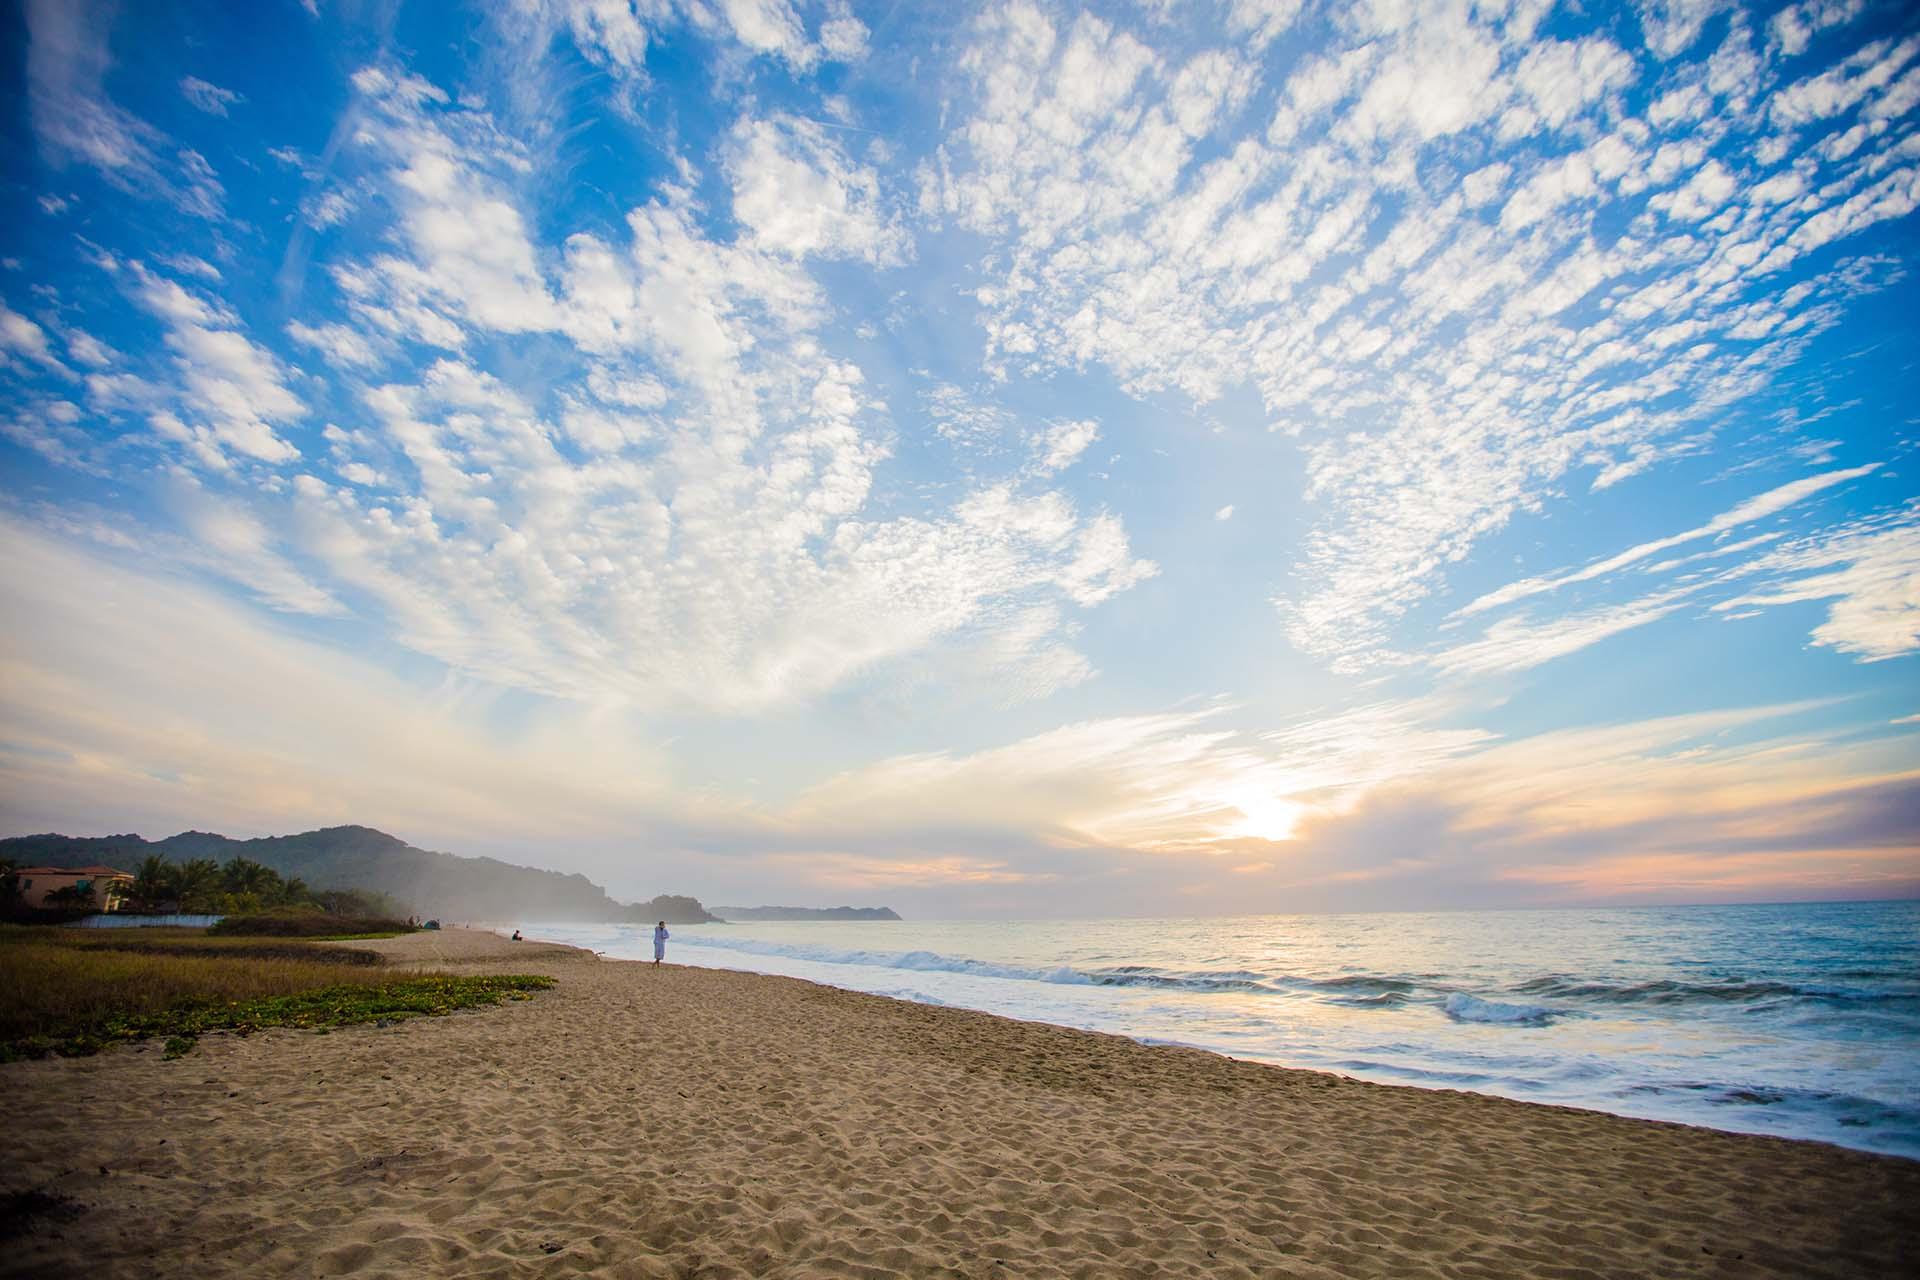 O cenário do litoral de San Pancho, na Riviera Nayarit